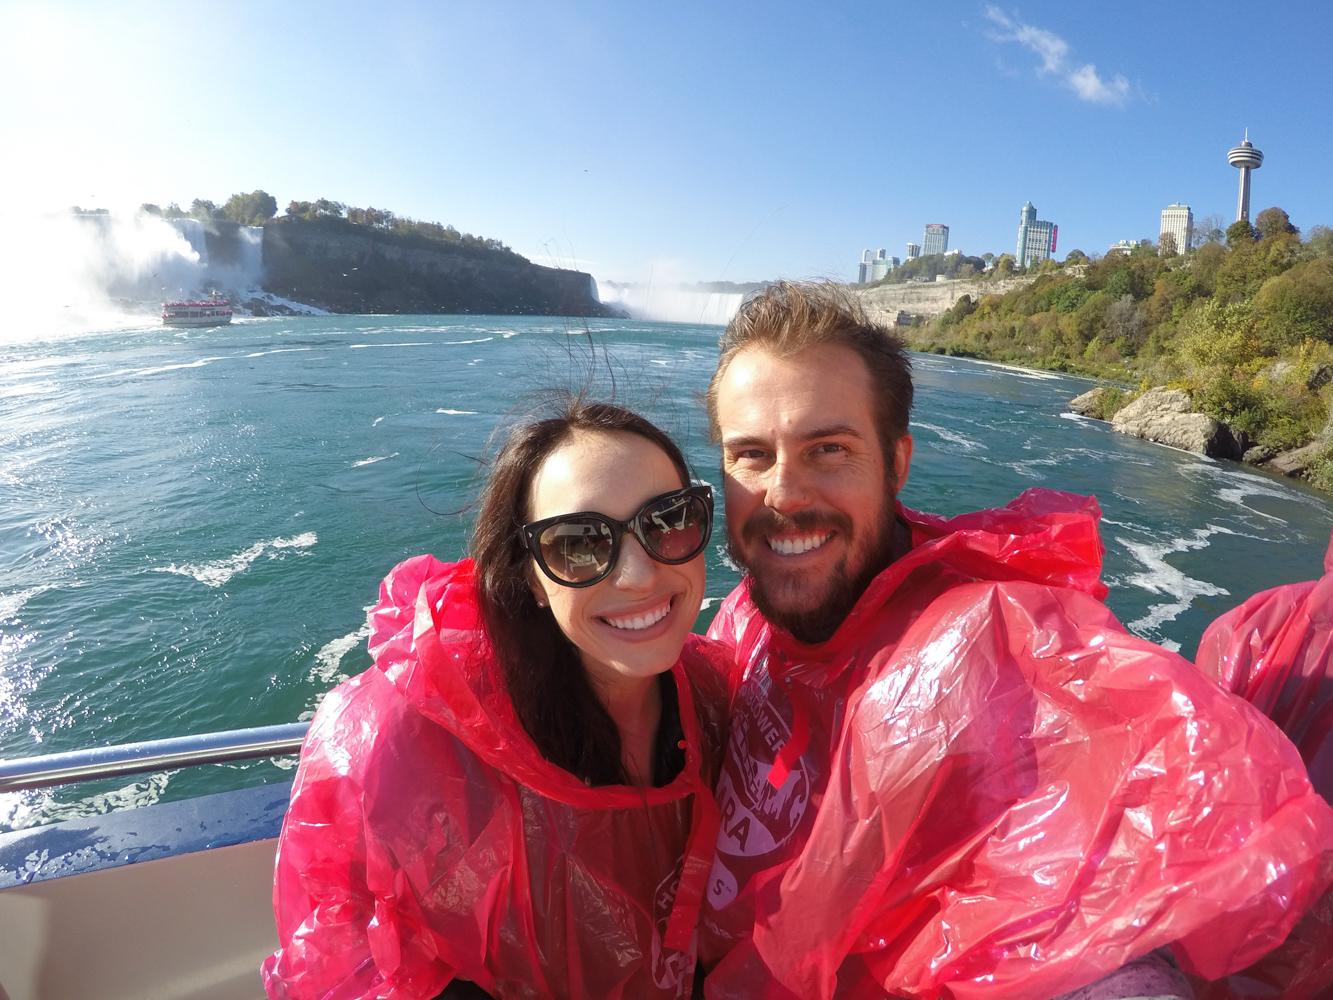 Niagara Falls Boat Ride in Canada